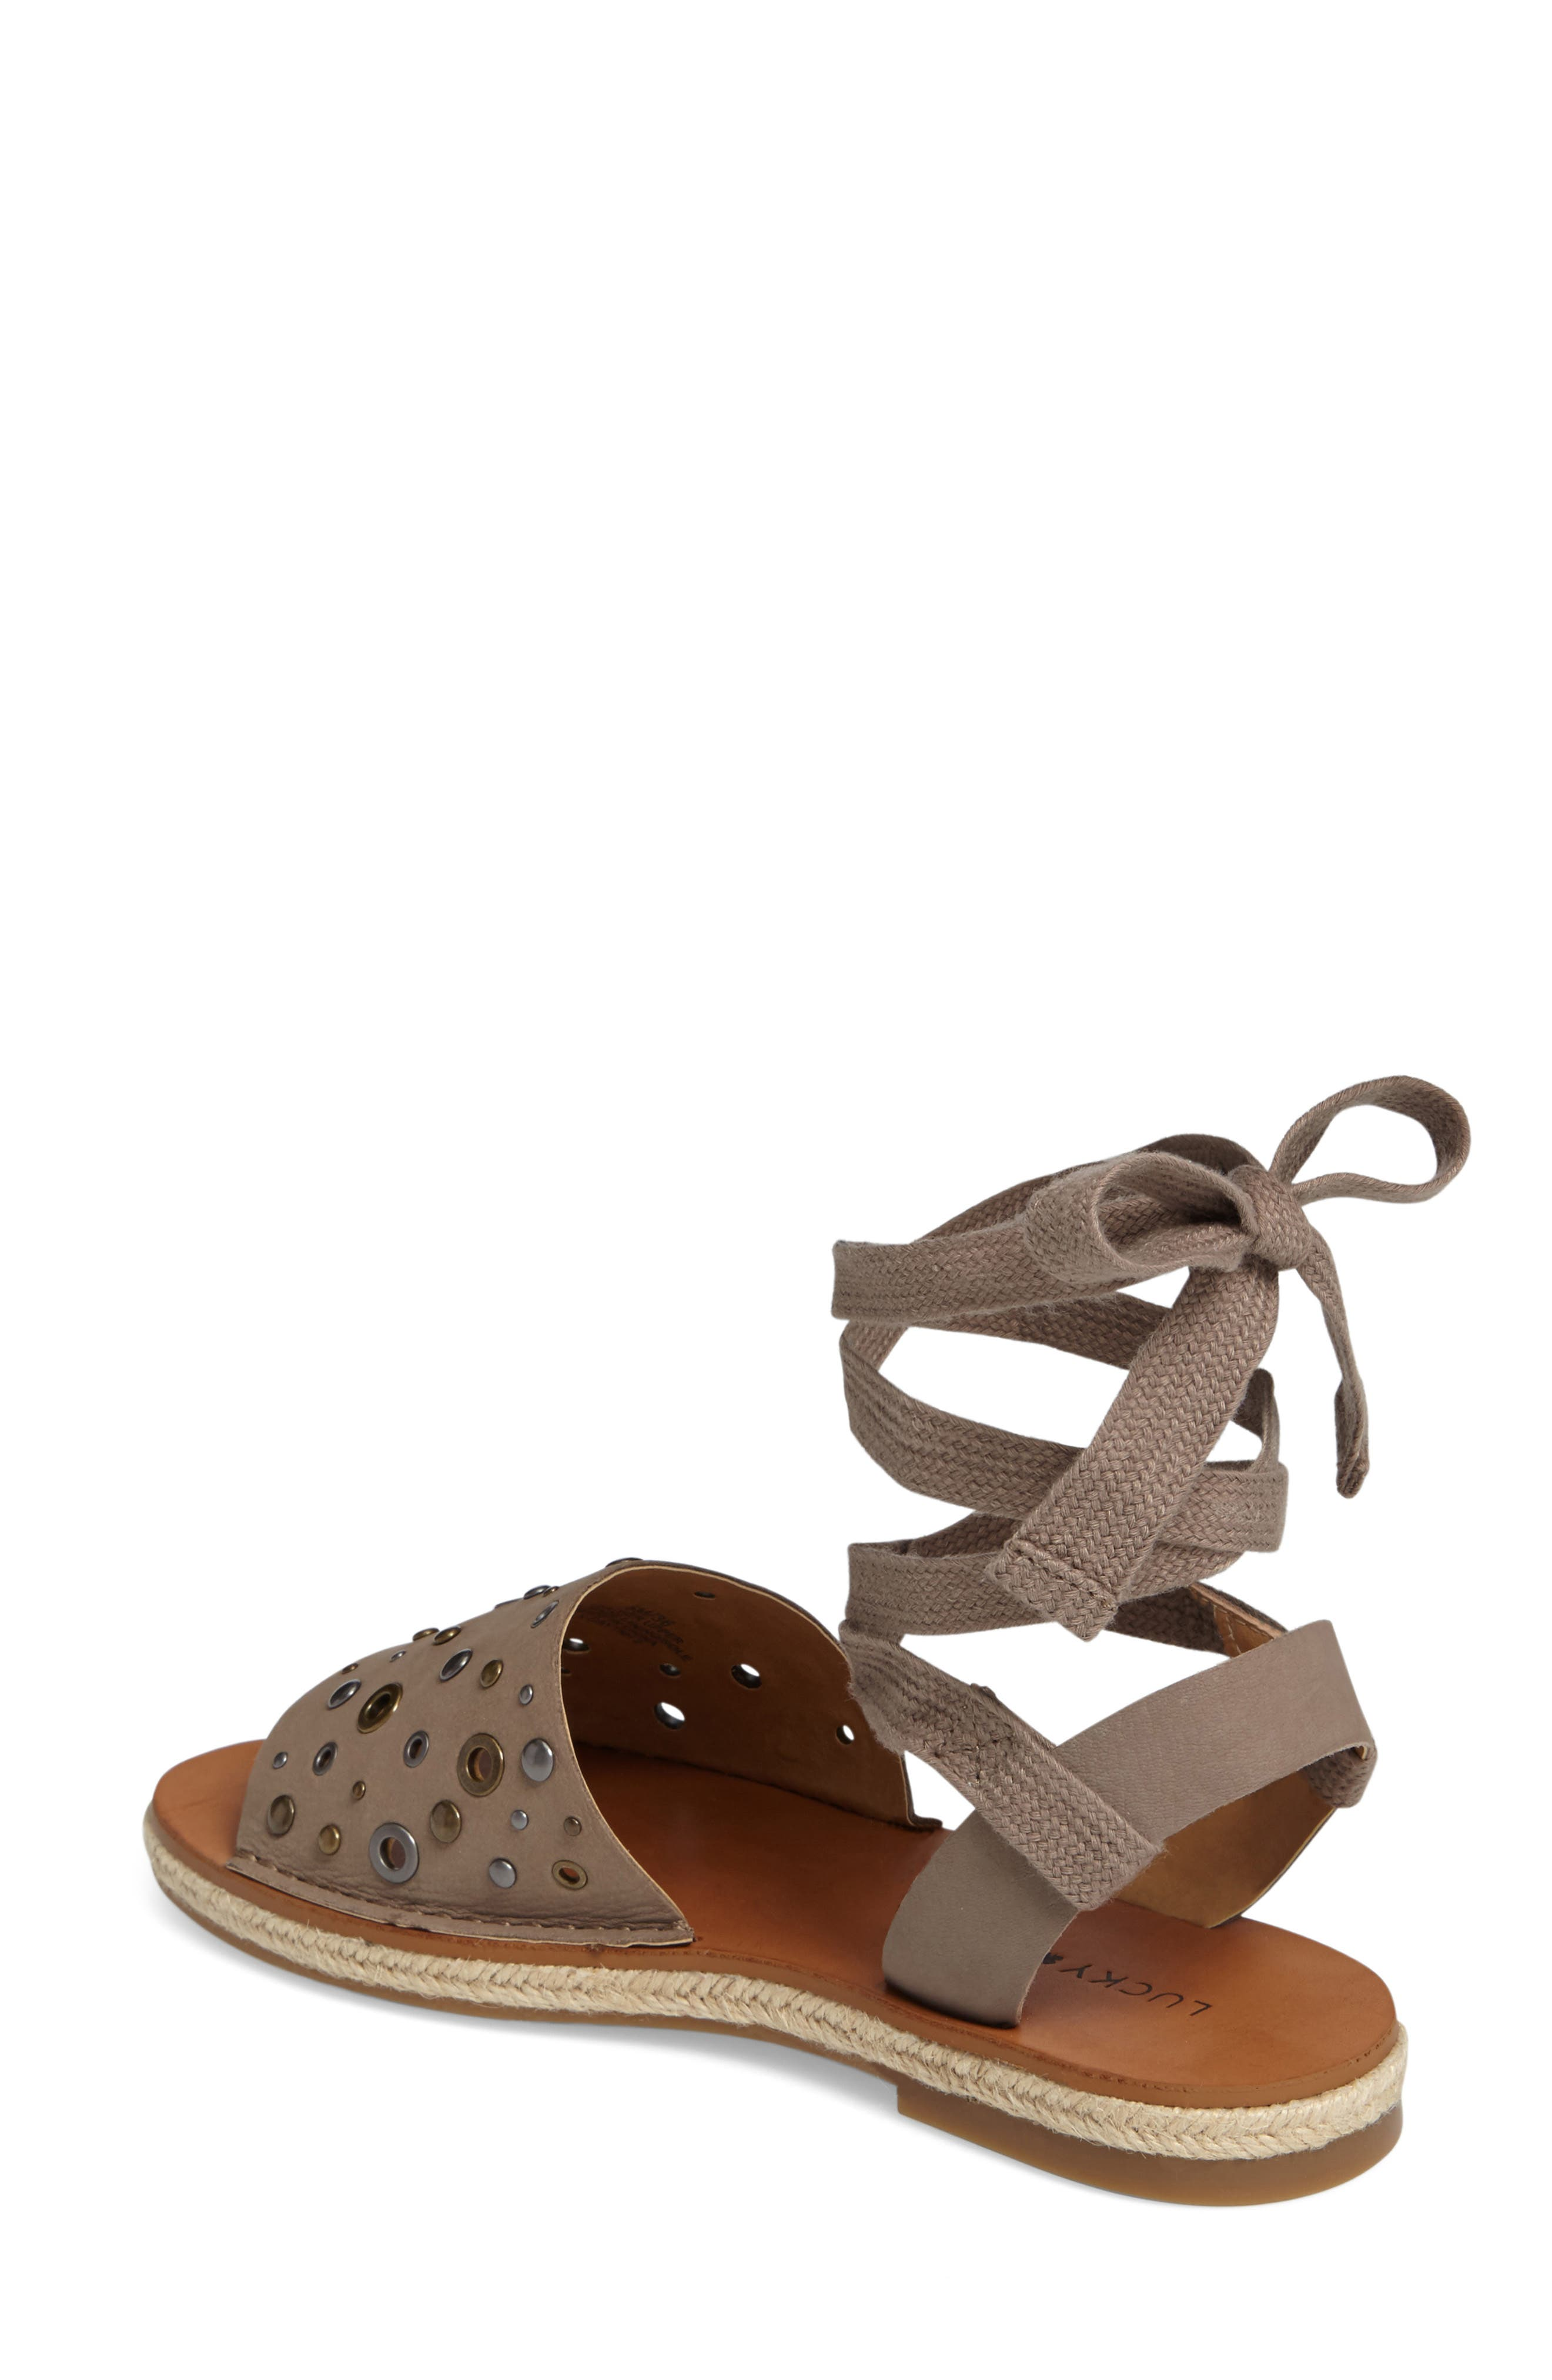 Daytah Ankle Tie Sandal,                             Alternate thumbnail 6, color,